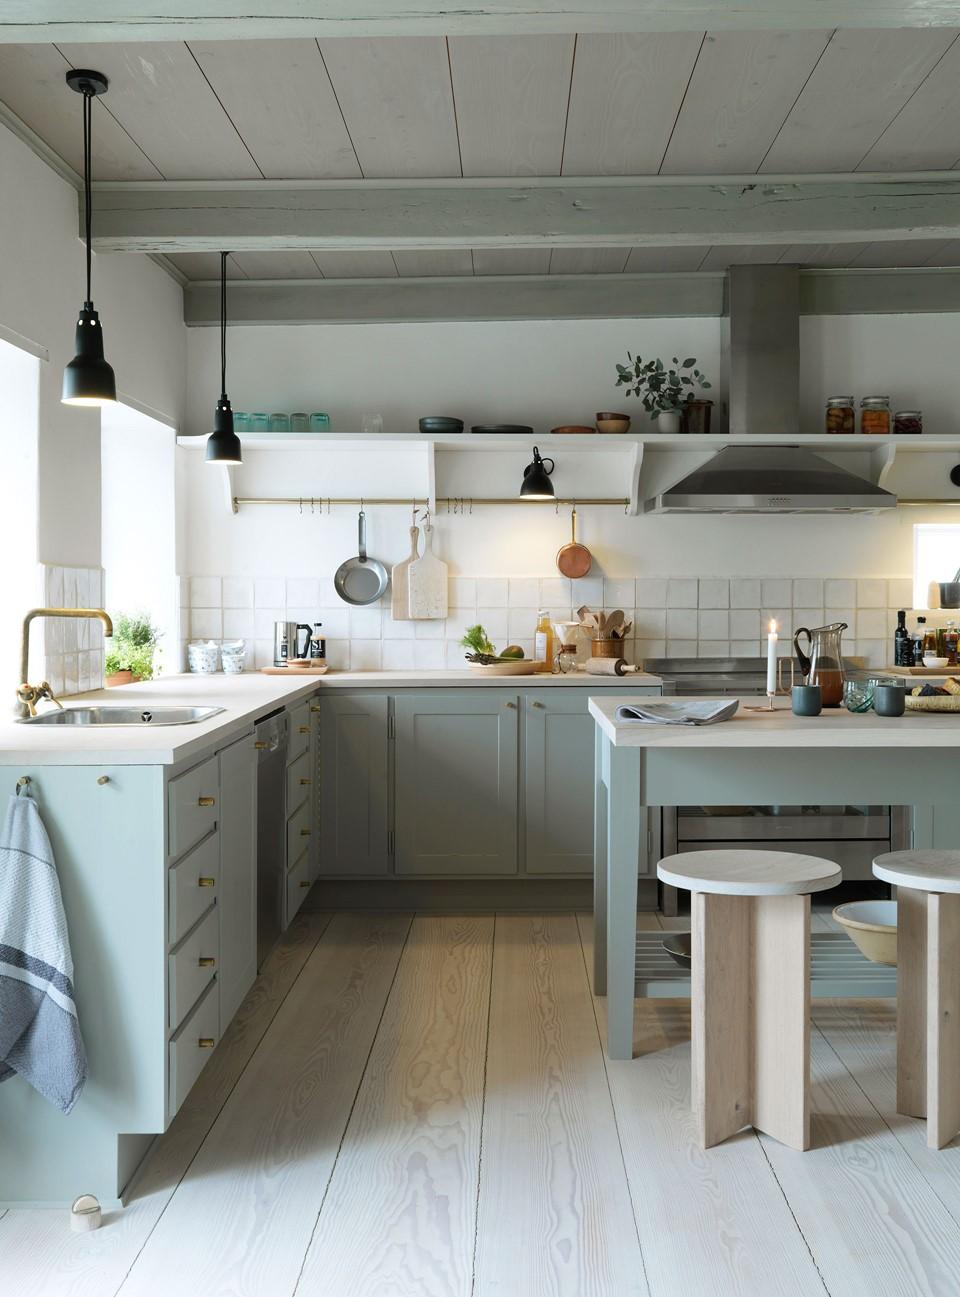 douglas fir floor lye white soap underfloor heating kitchen dinesen country home.jpg